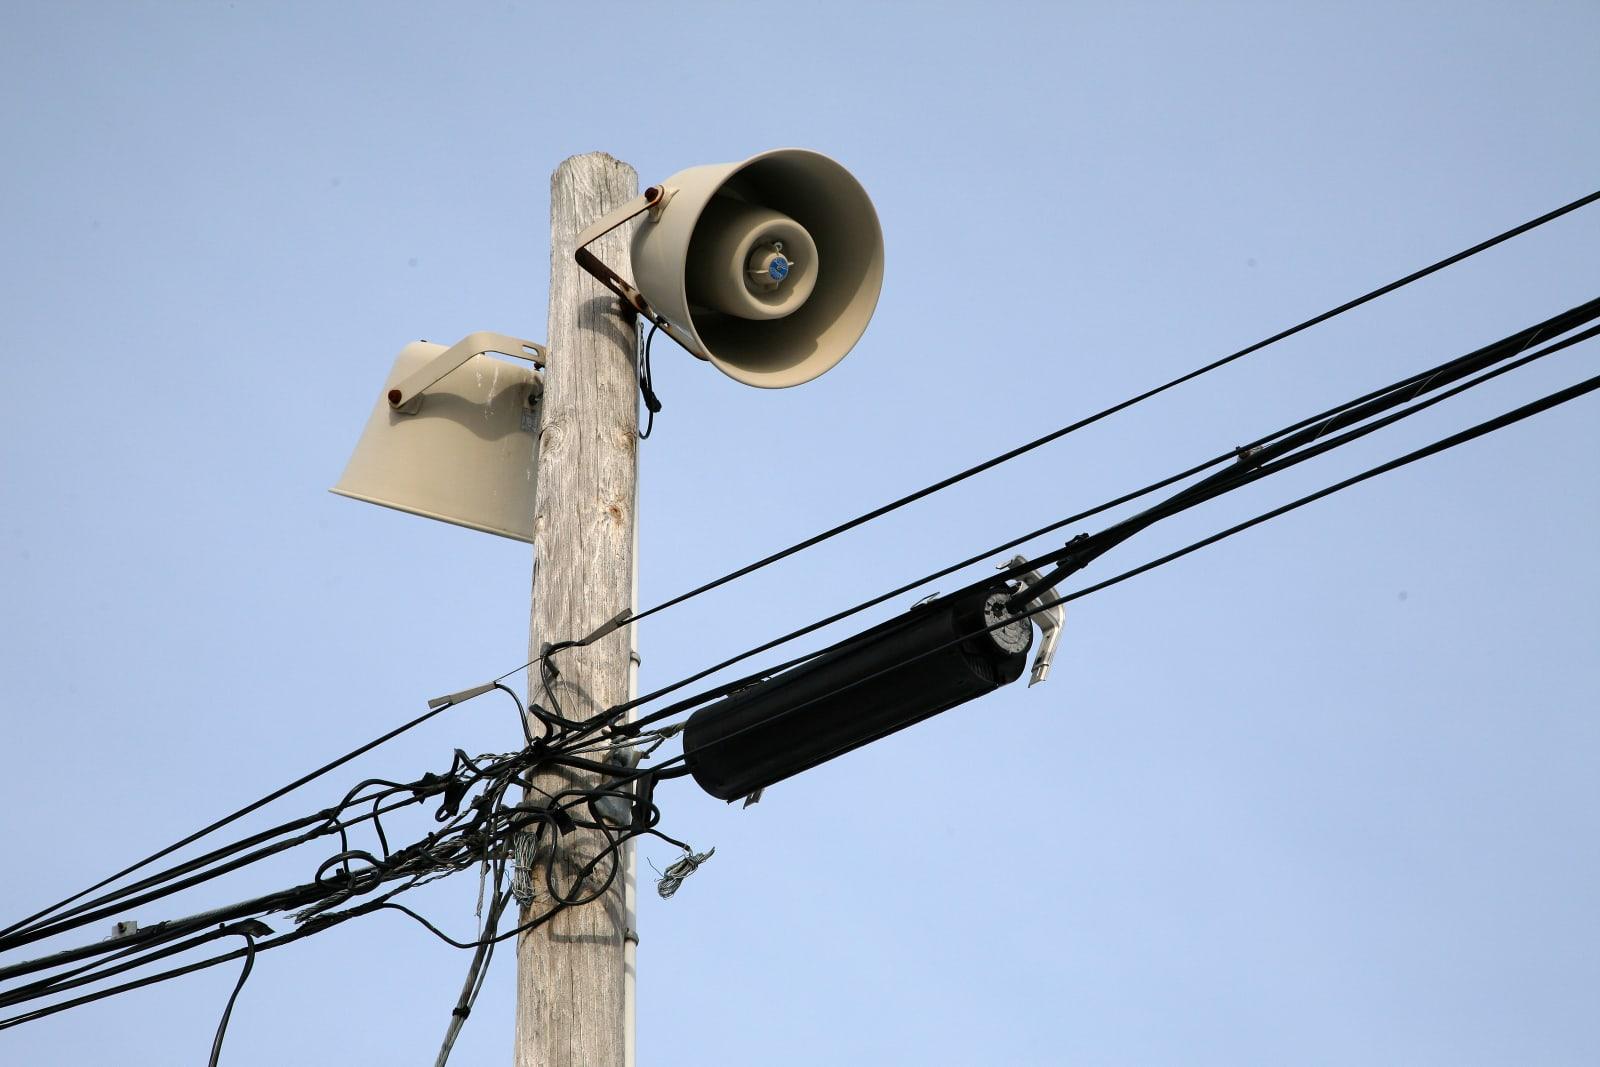 Warning sirens atop utility pole